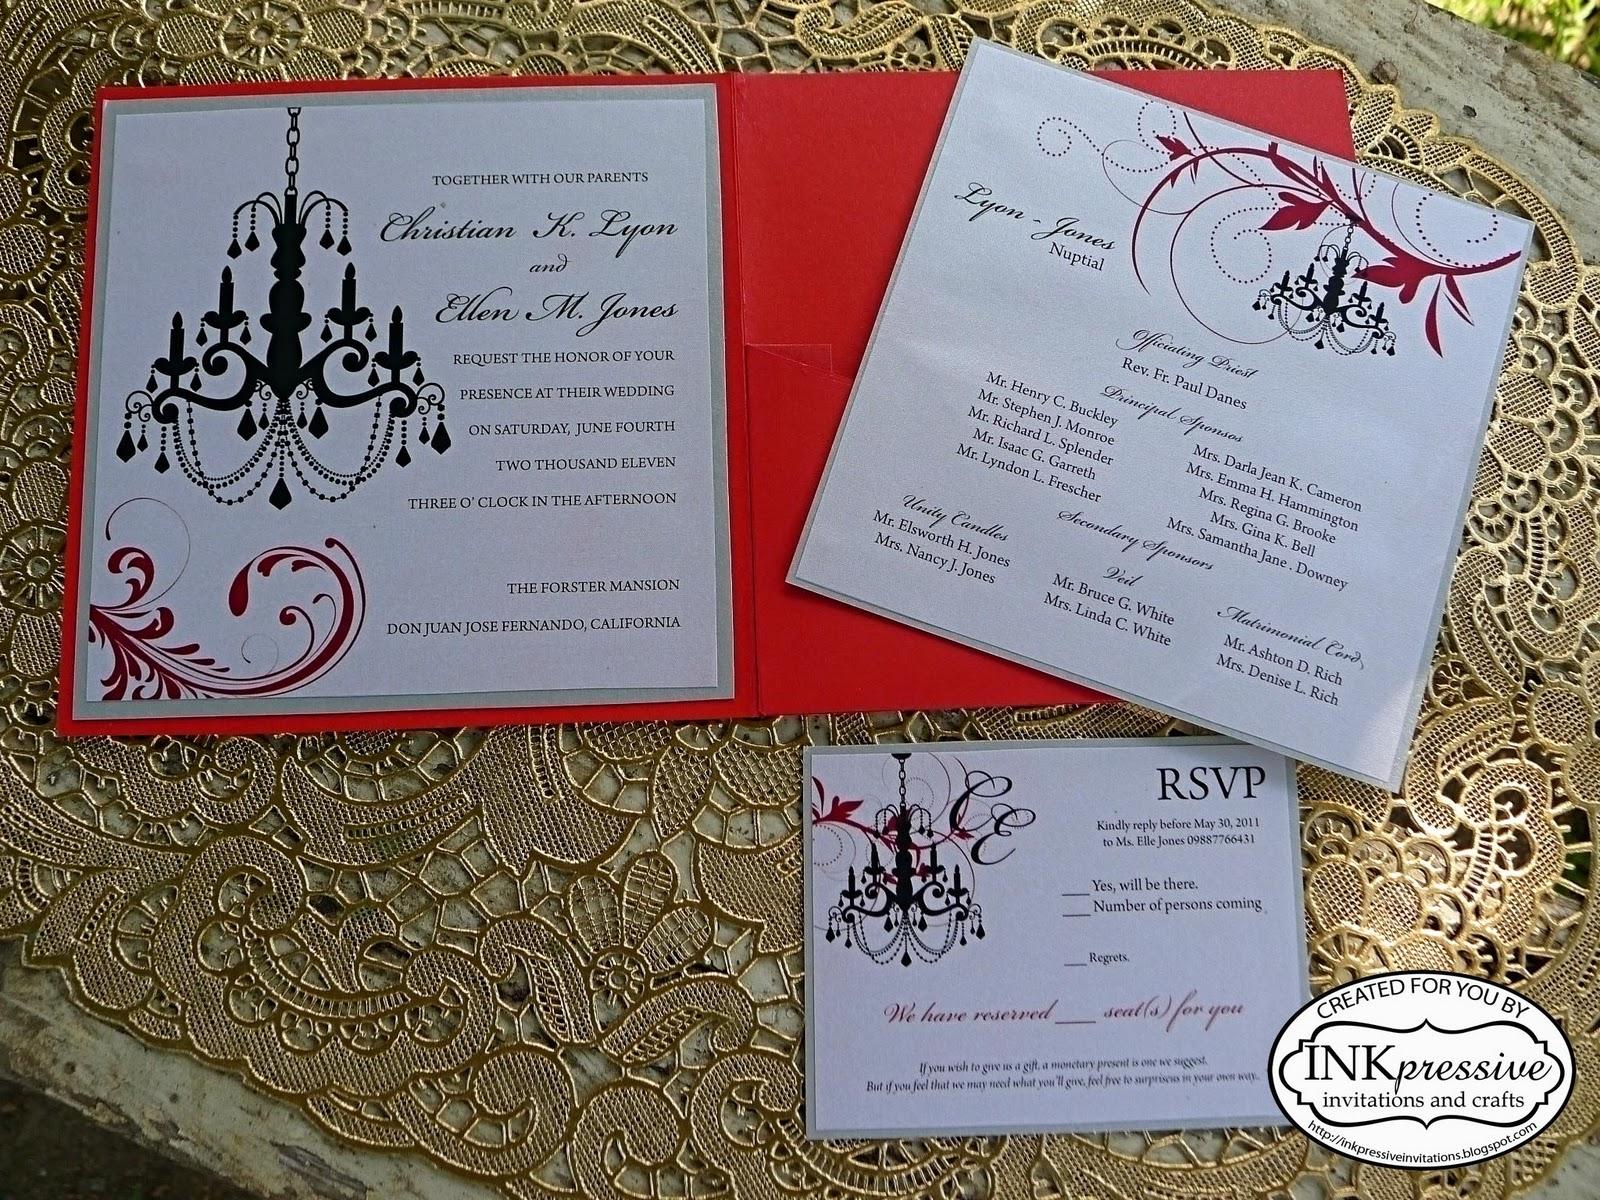 Chandelier Wedding Invitation | INKPRESSIVE INVITATIONS